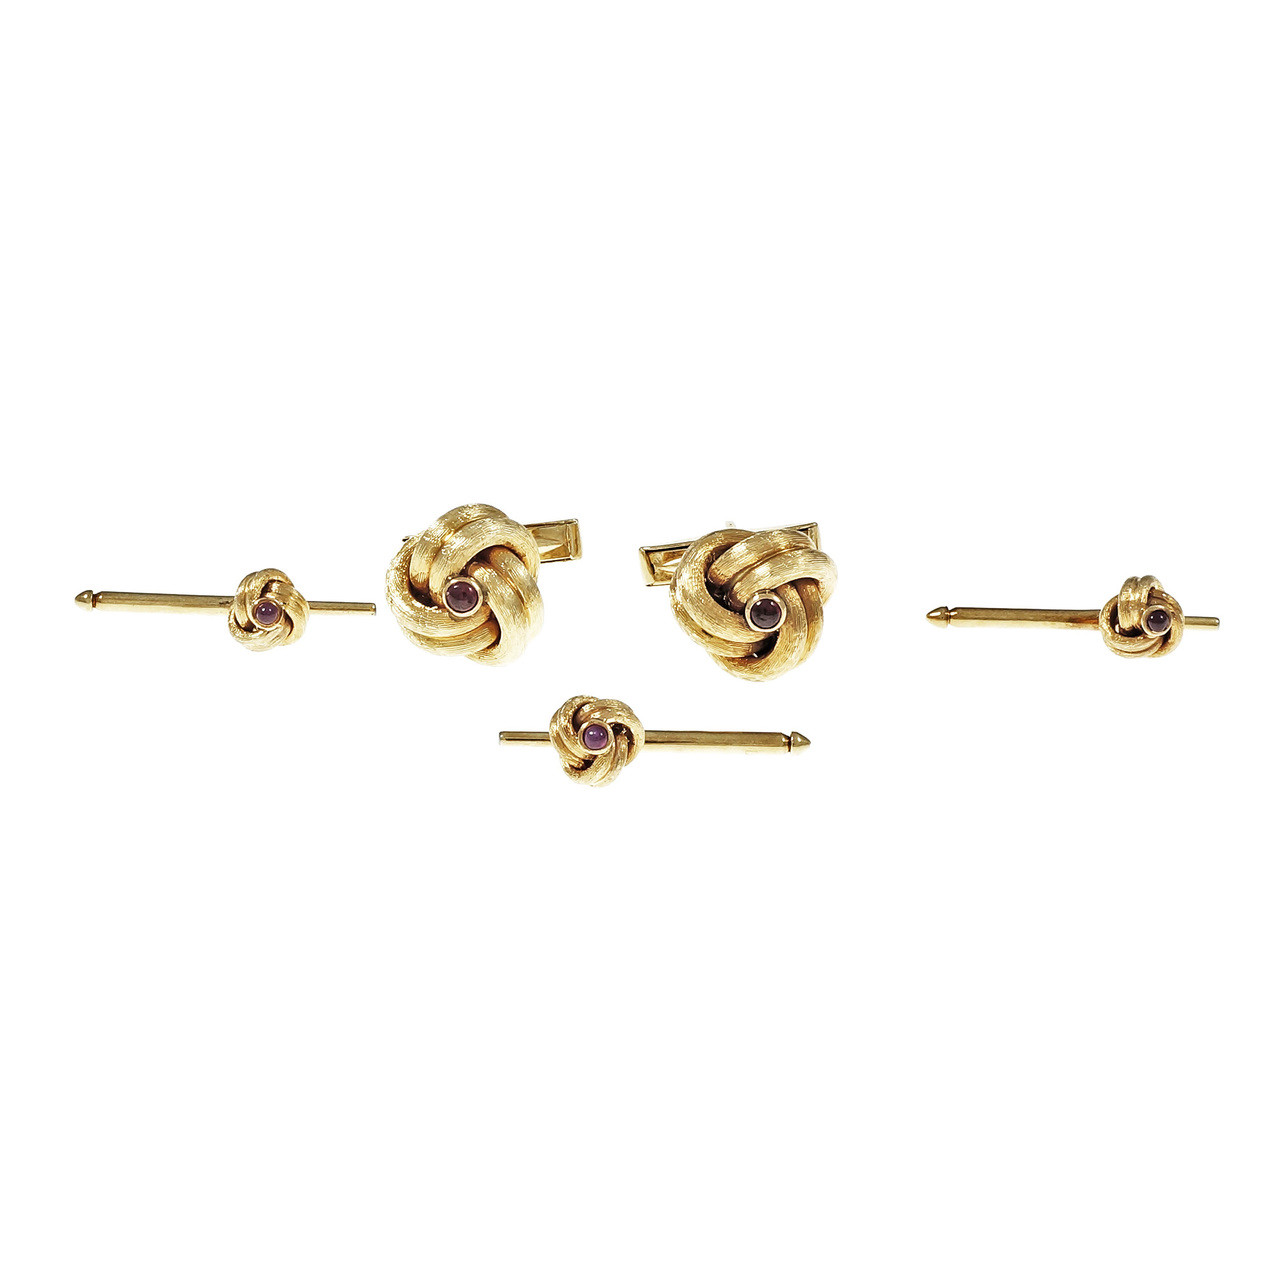 b07fd64f42e9d Vintage Tiffany & Co Cufflinks Shirt Stud Set Ruby 14k Yellow Gold 1950